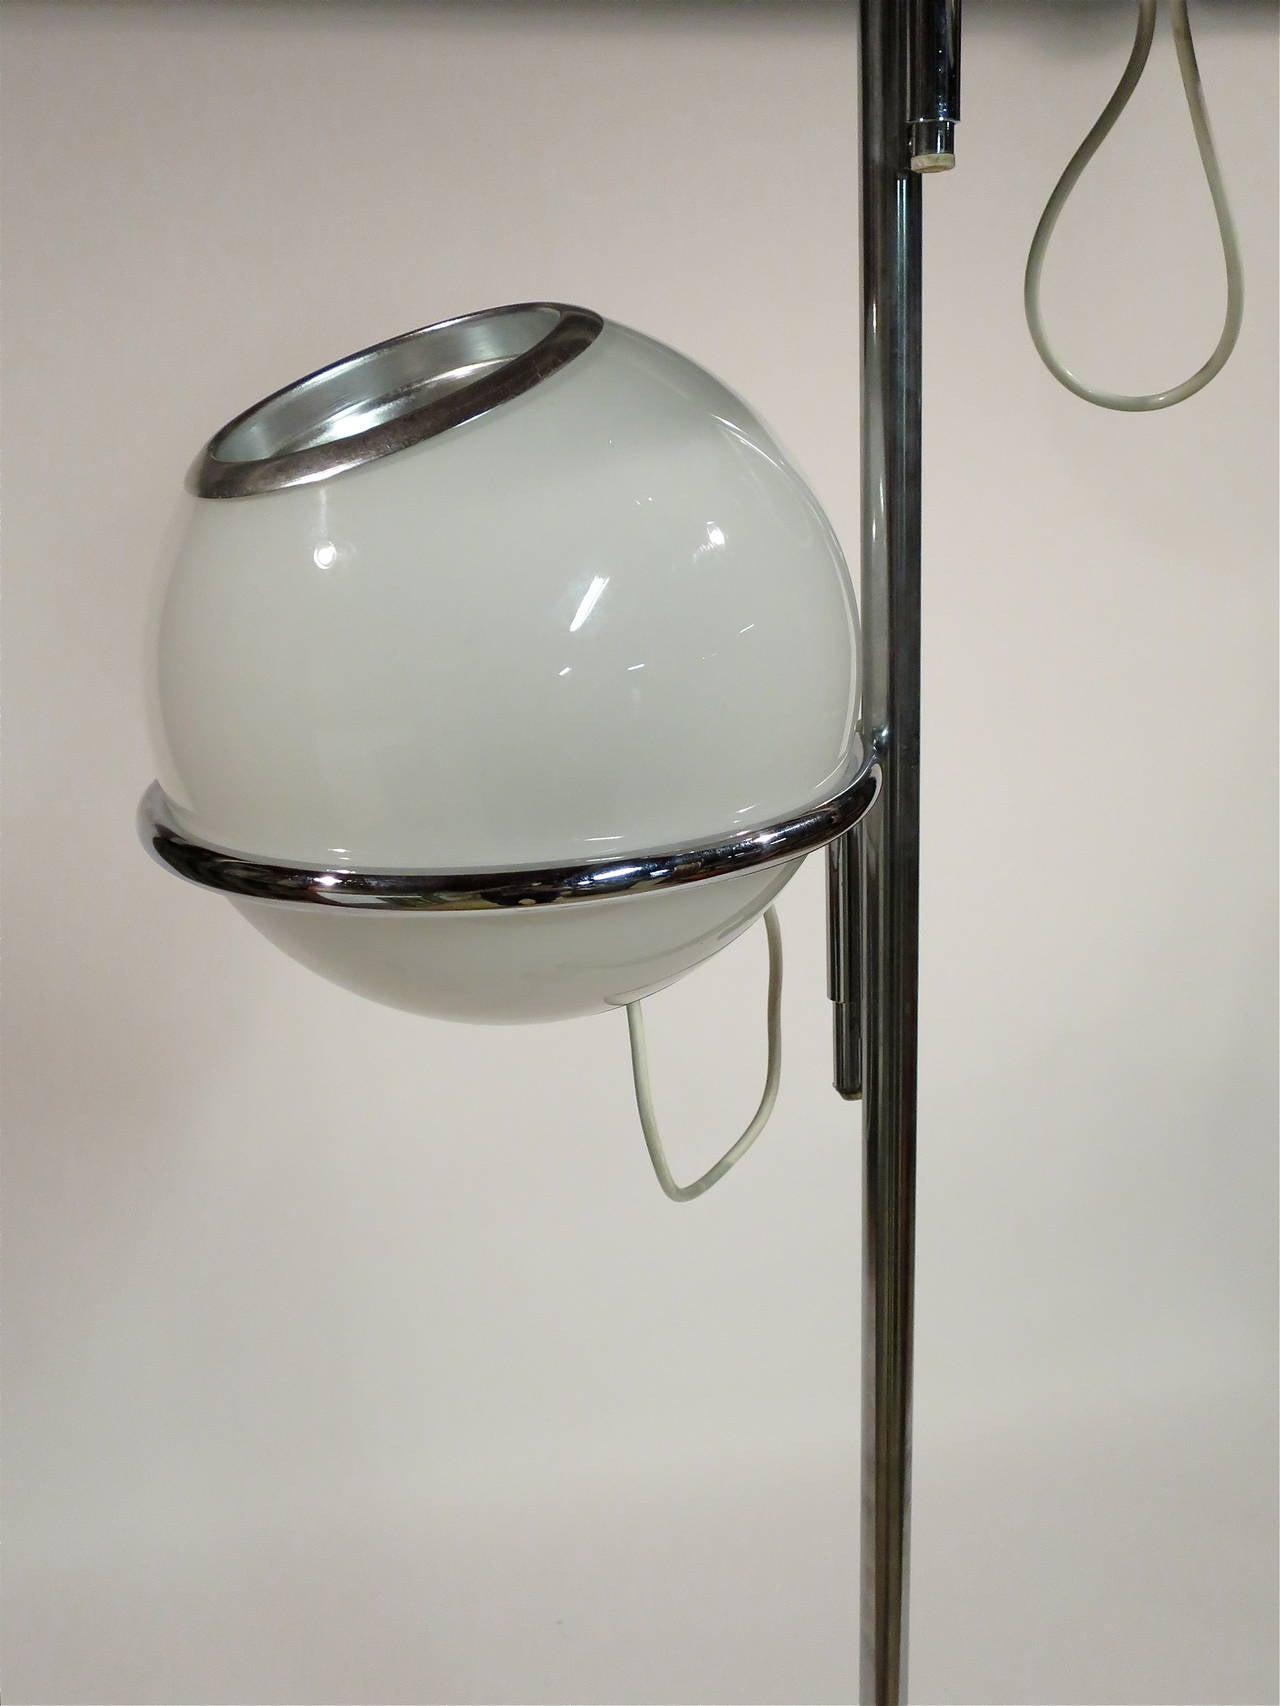 reggiani marble base floor lamp at 1stdibs. Black Bedroom Furniture Sets. Home Design Ideas